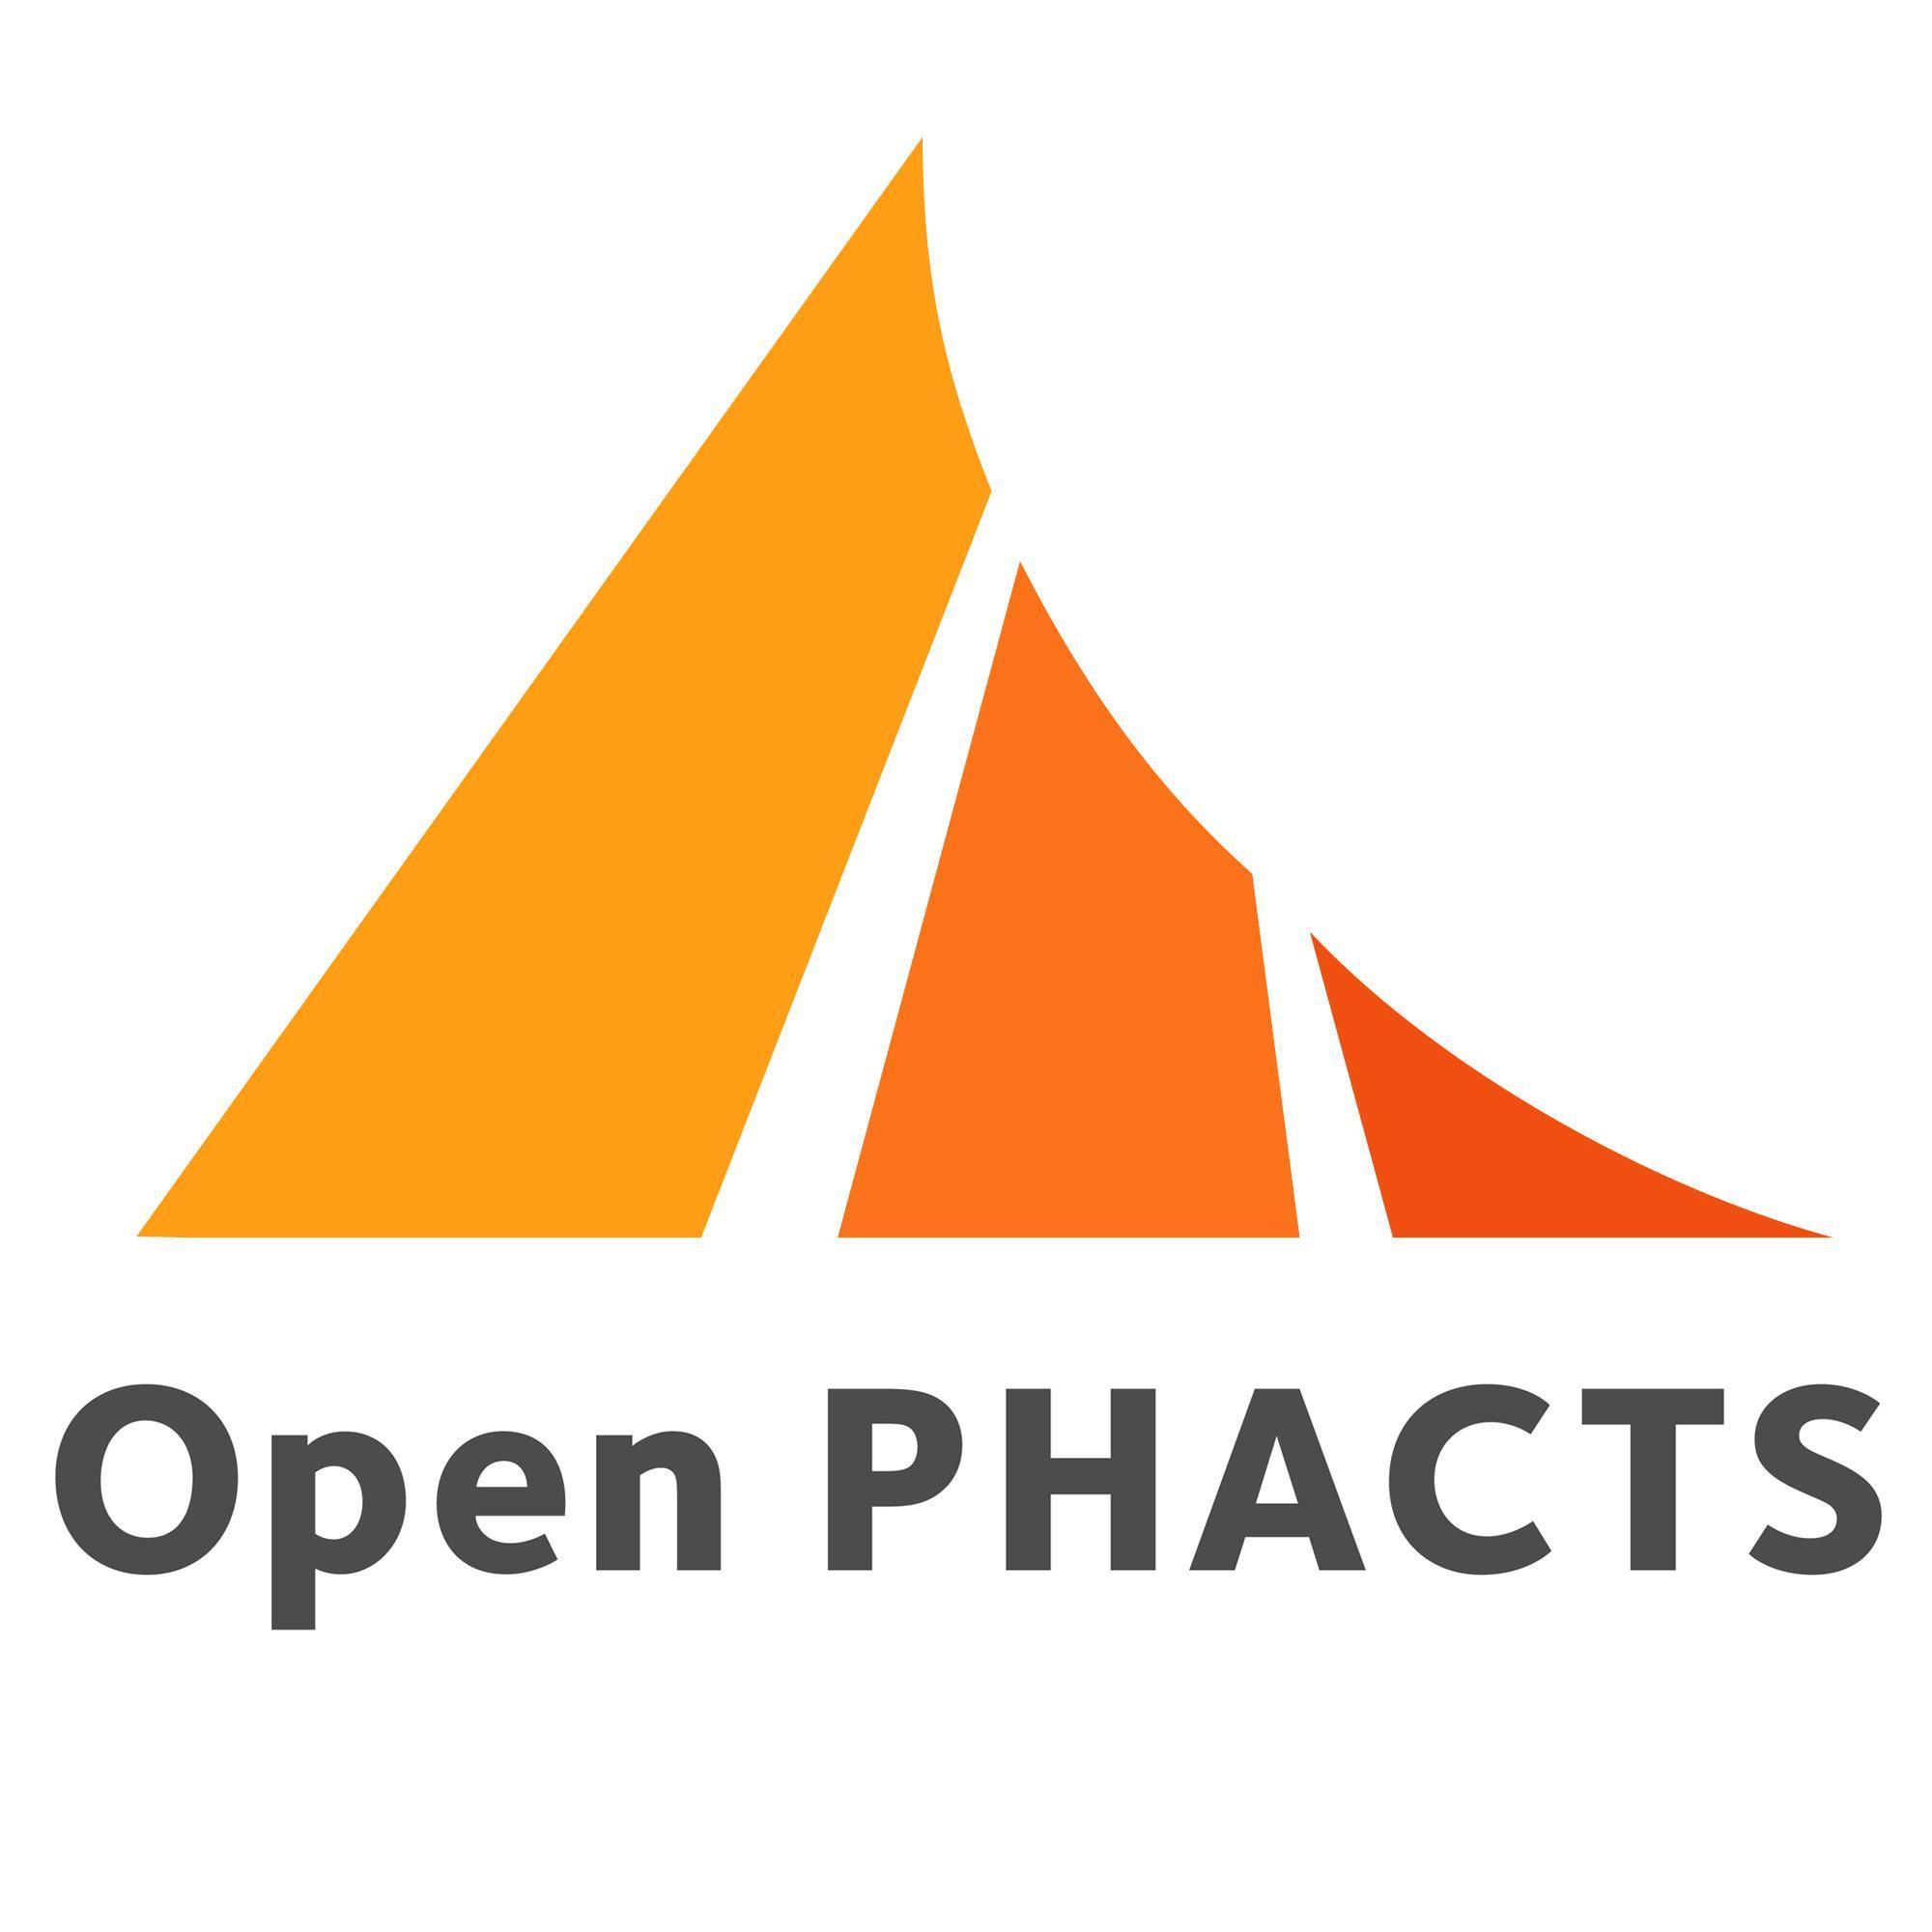 open phacts open phacts twitter